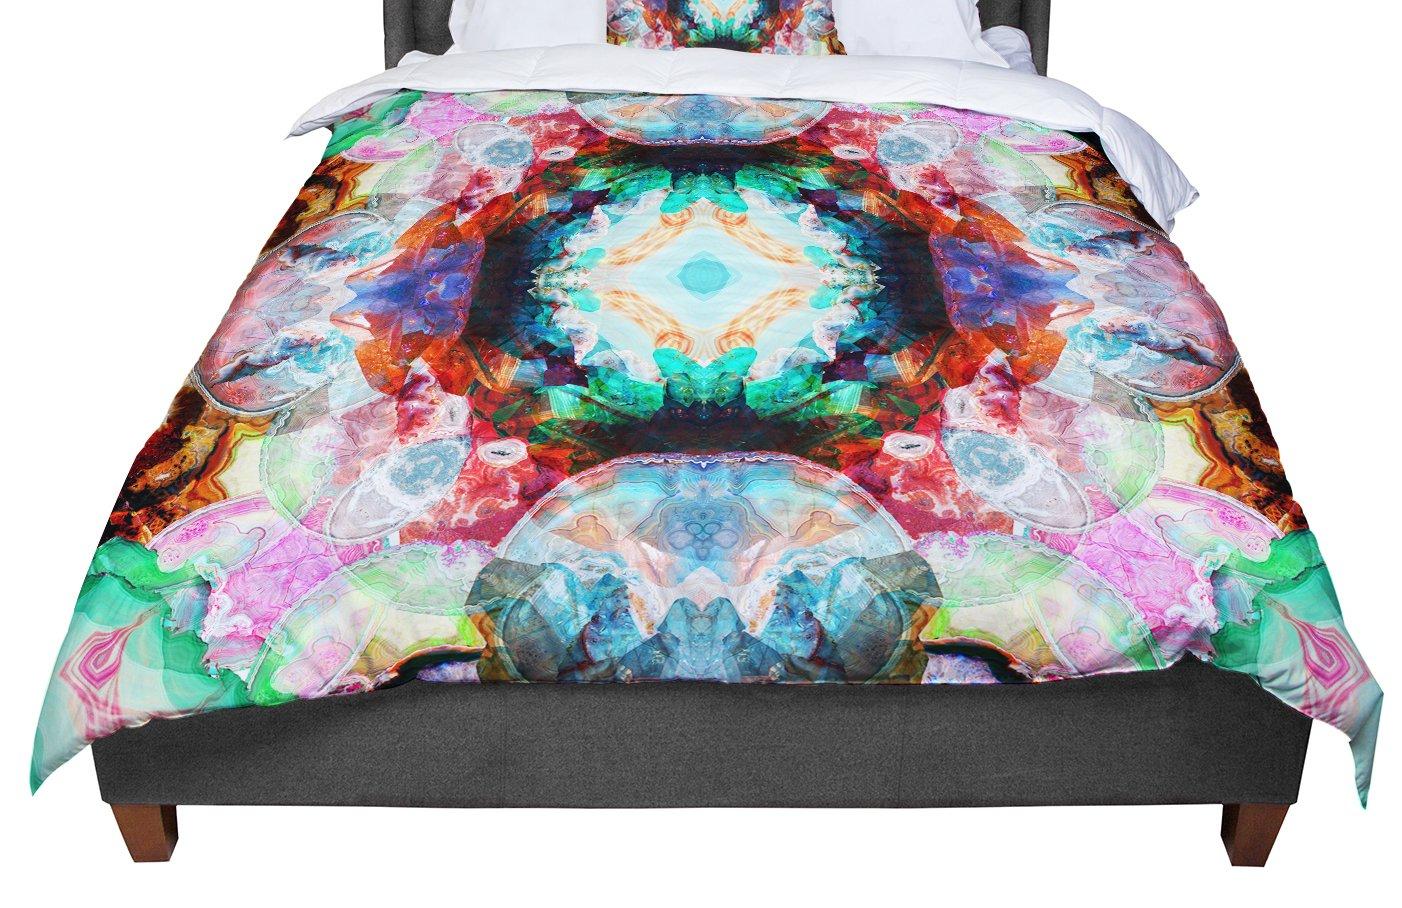 68 X 88 KESS InHouse Danii Pollehn Achat II Multicolor Twin Comforter